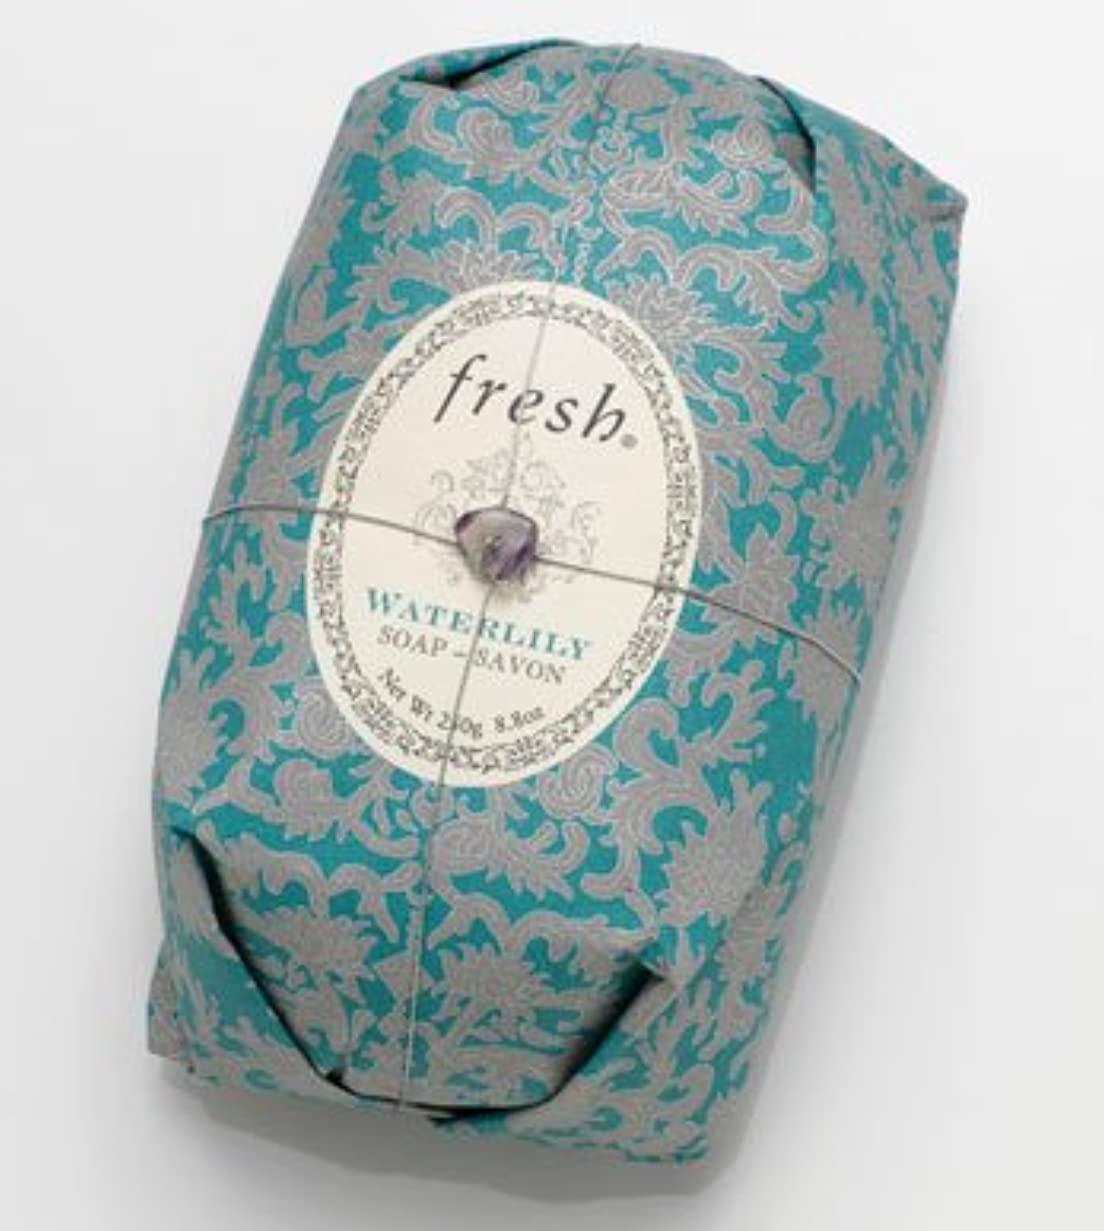 Fresh WATERLILY SOAP (フレッシュ ウオーターリリー ソープ) 8.8 oz (250g) Soap (石鹸) by Fresh